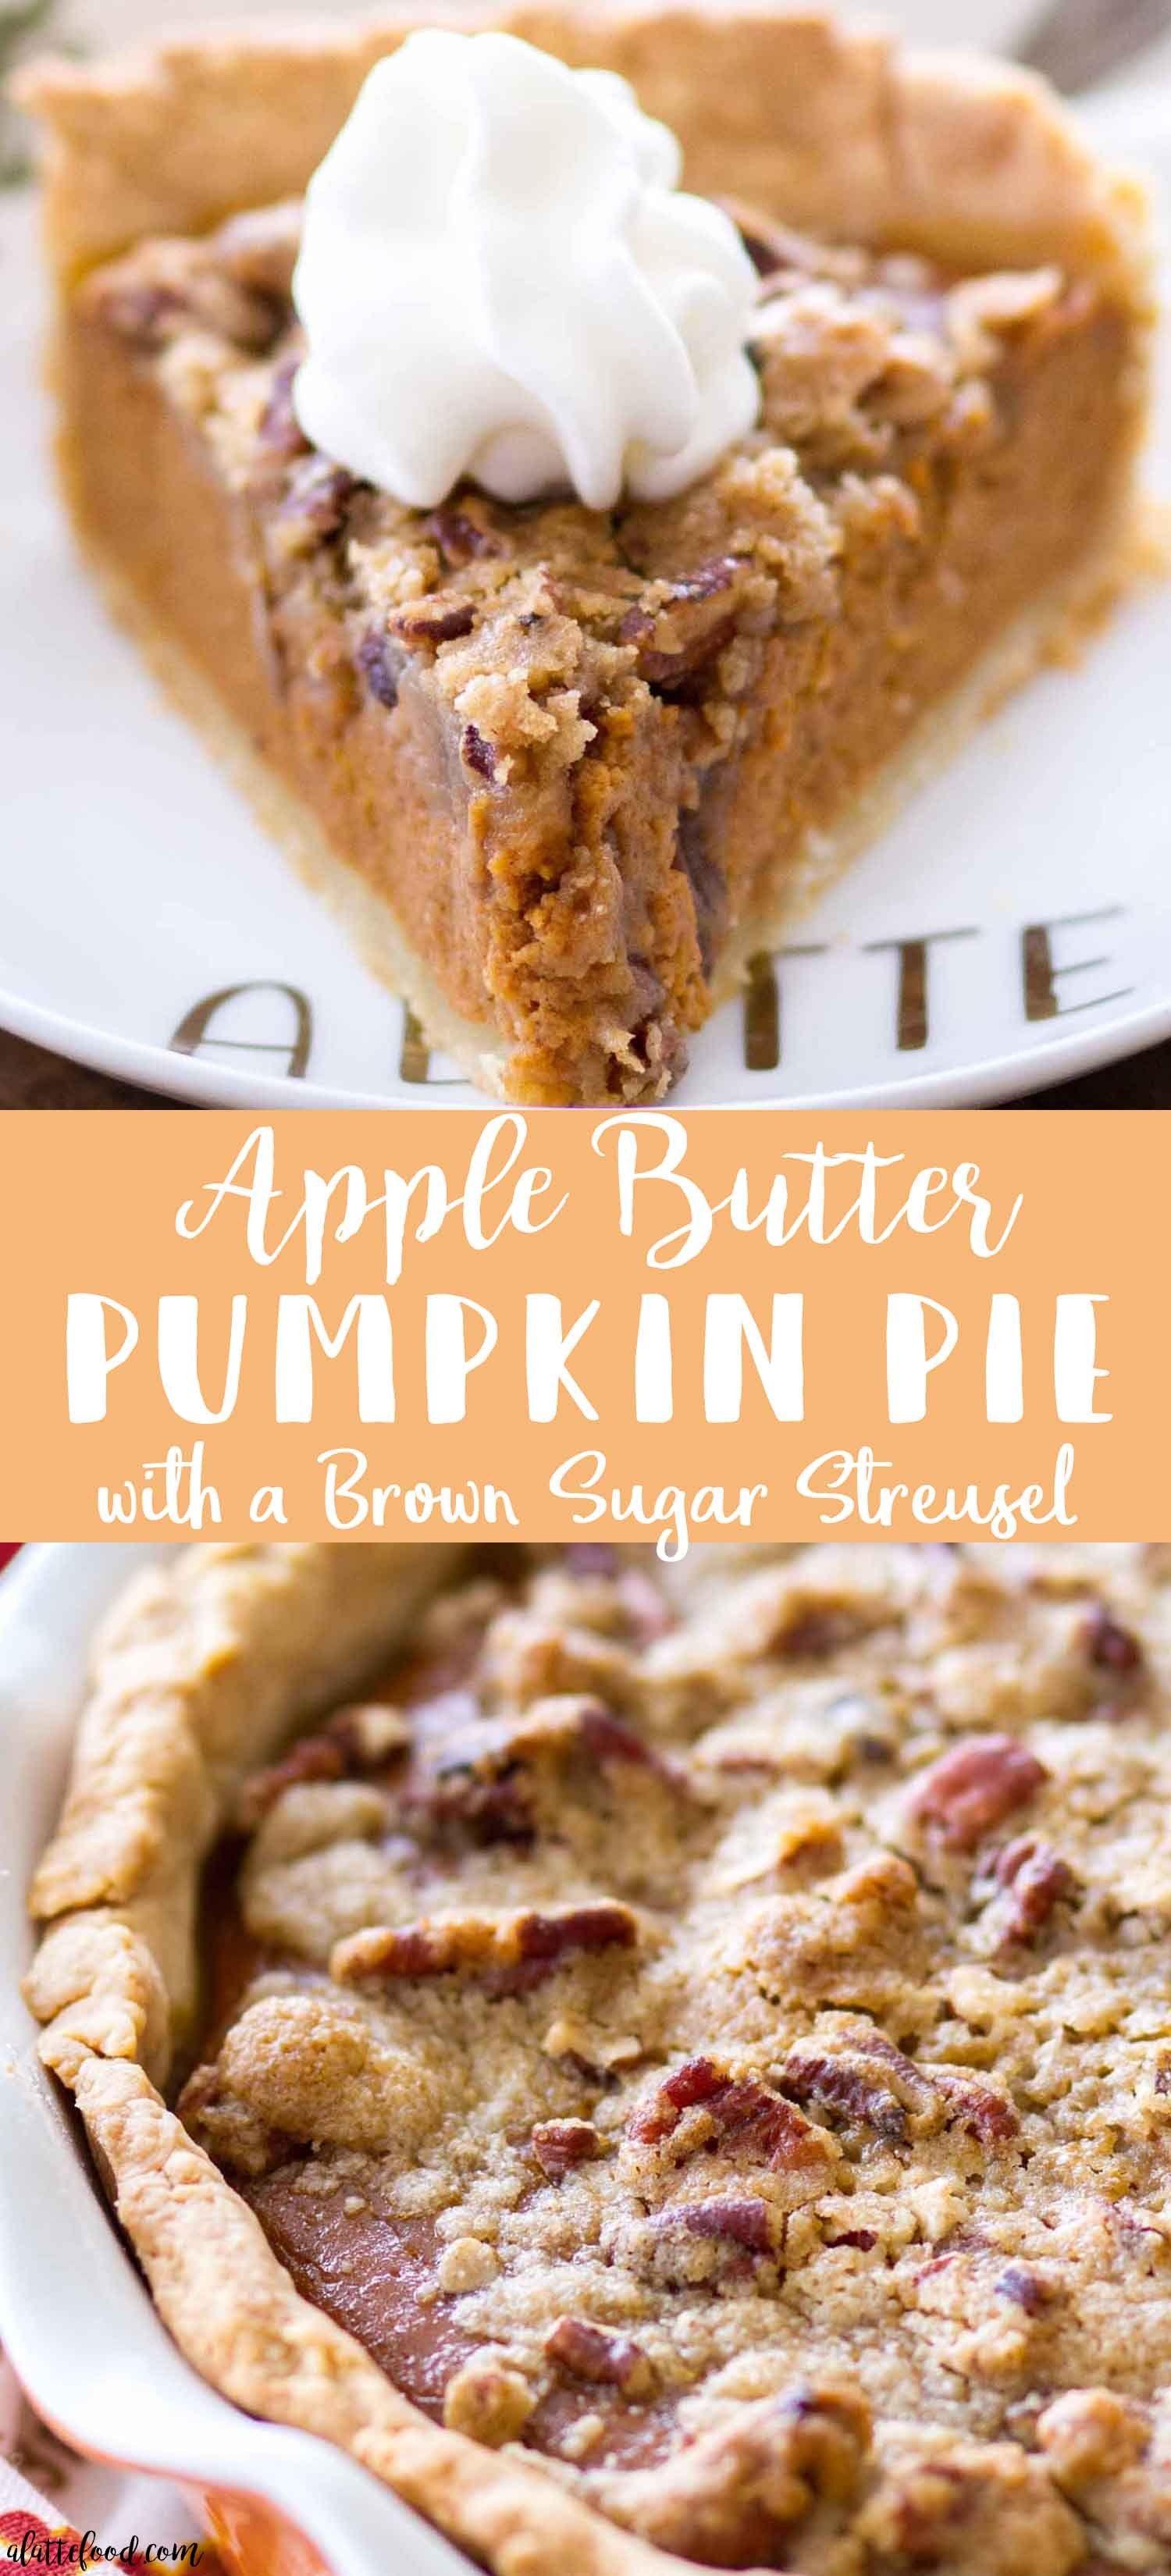 This Apple Butter Pumpkin Pie With Brown Sugar Streusel Is A Fun